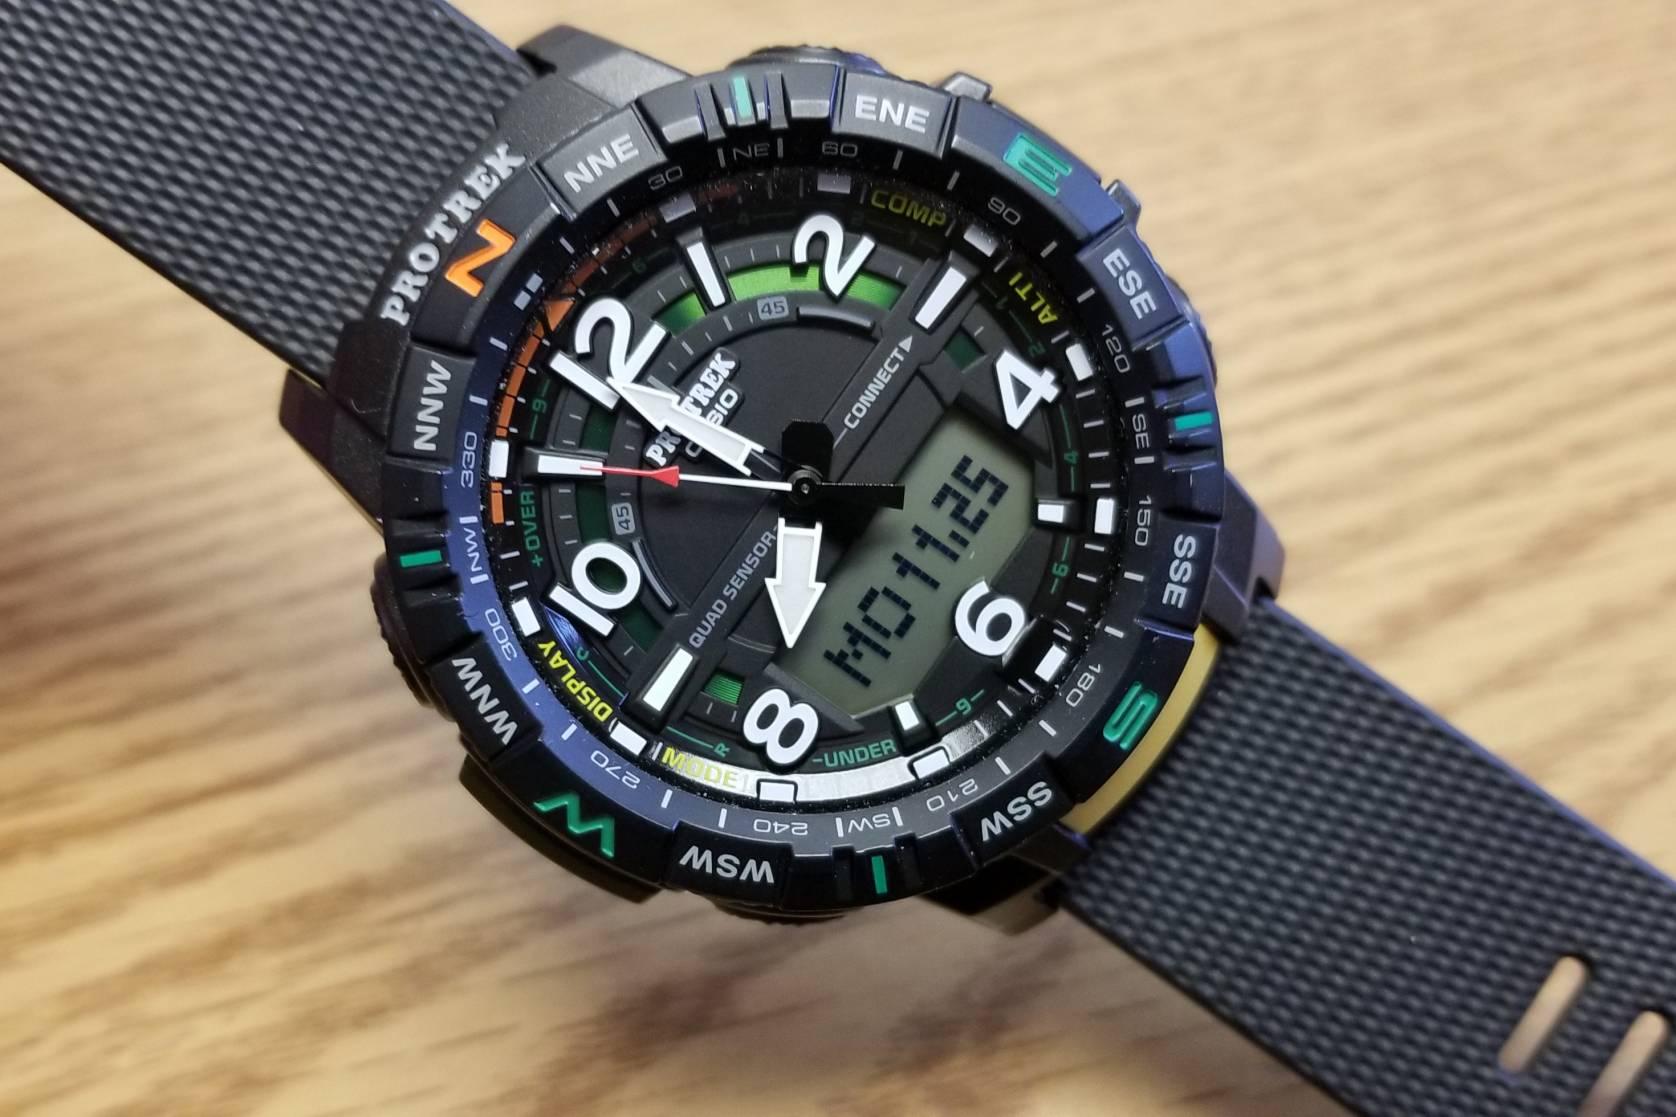 Casio Pro Trek PRT-B50 Watch Review